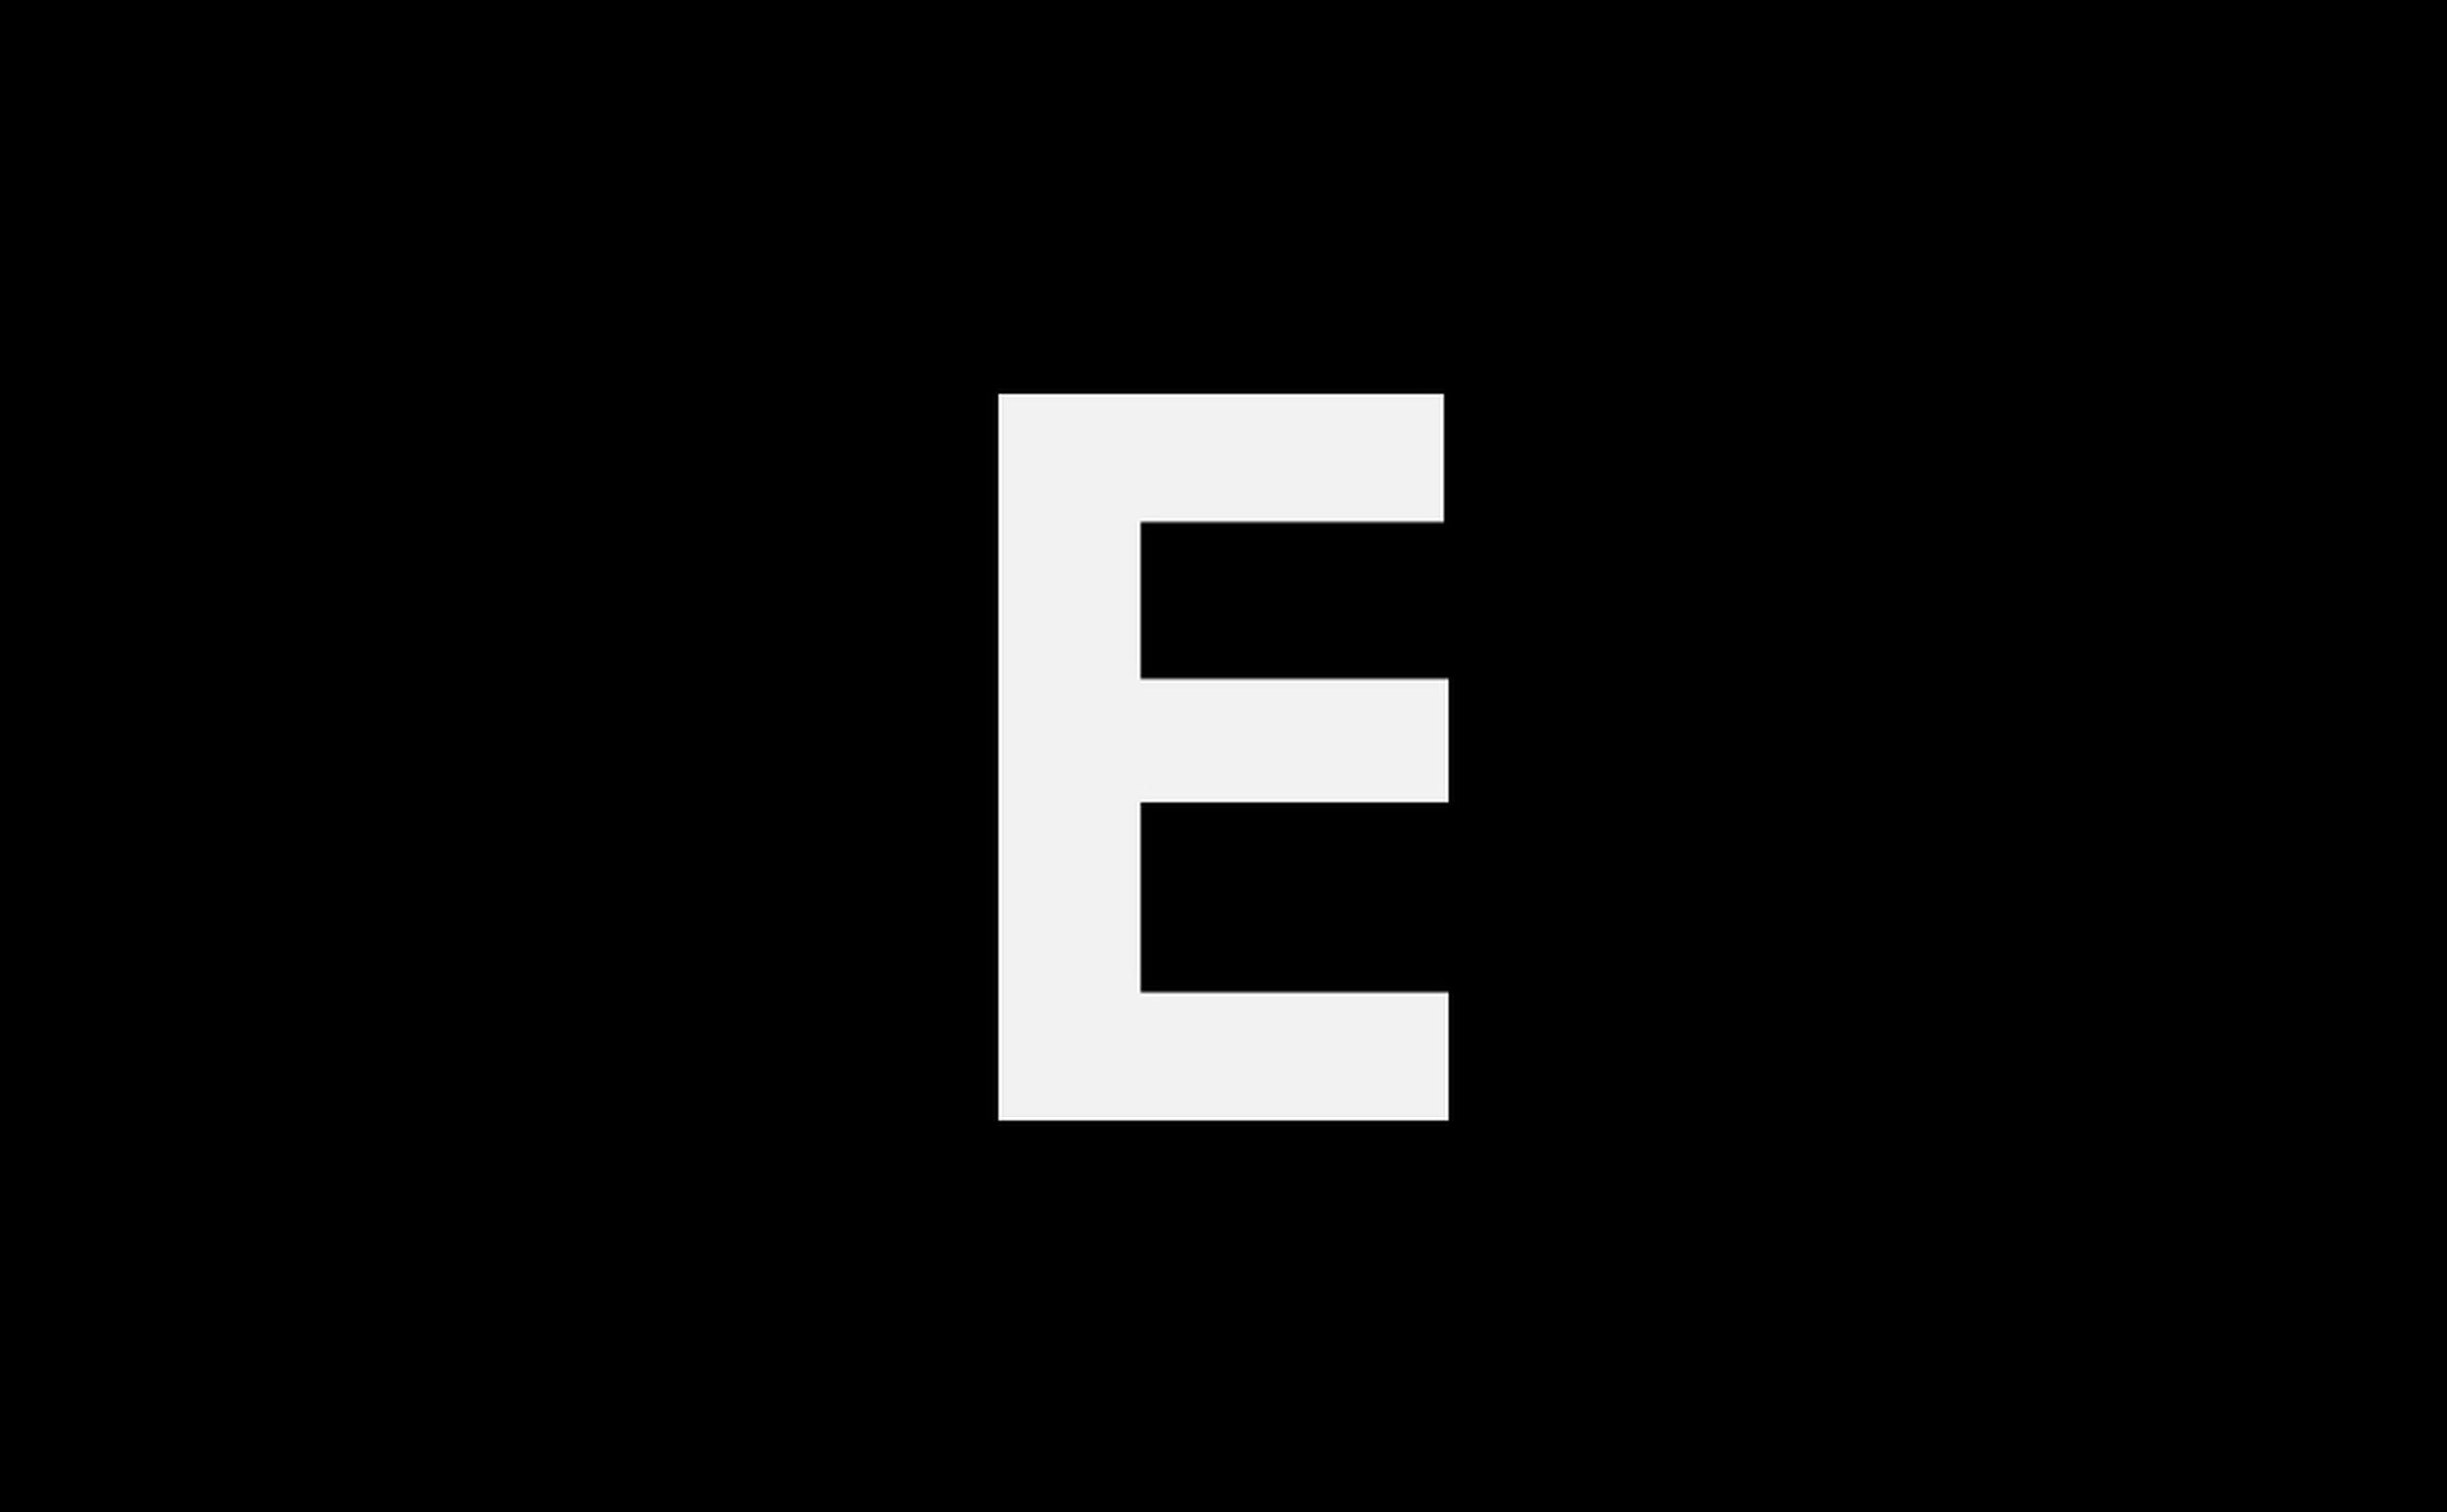 CLOSE-UP OF FRESH WHITE CROCUS FLOWERS